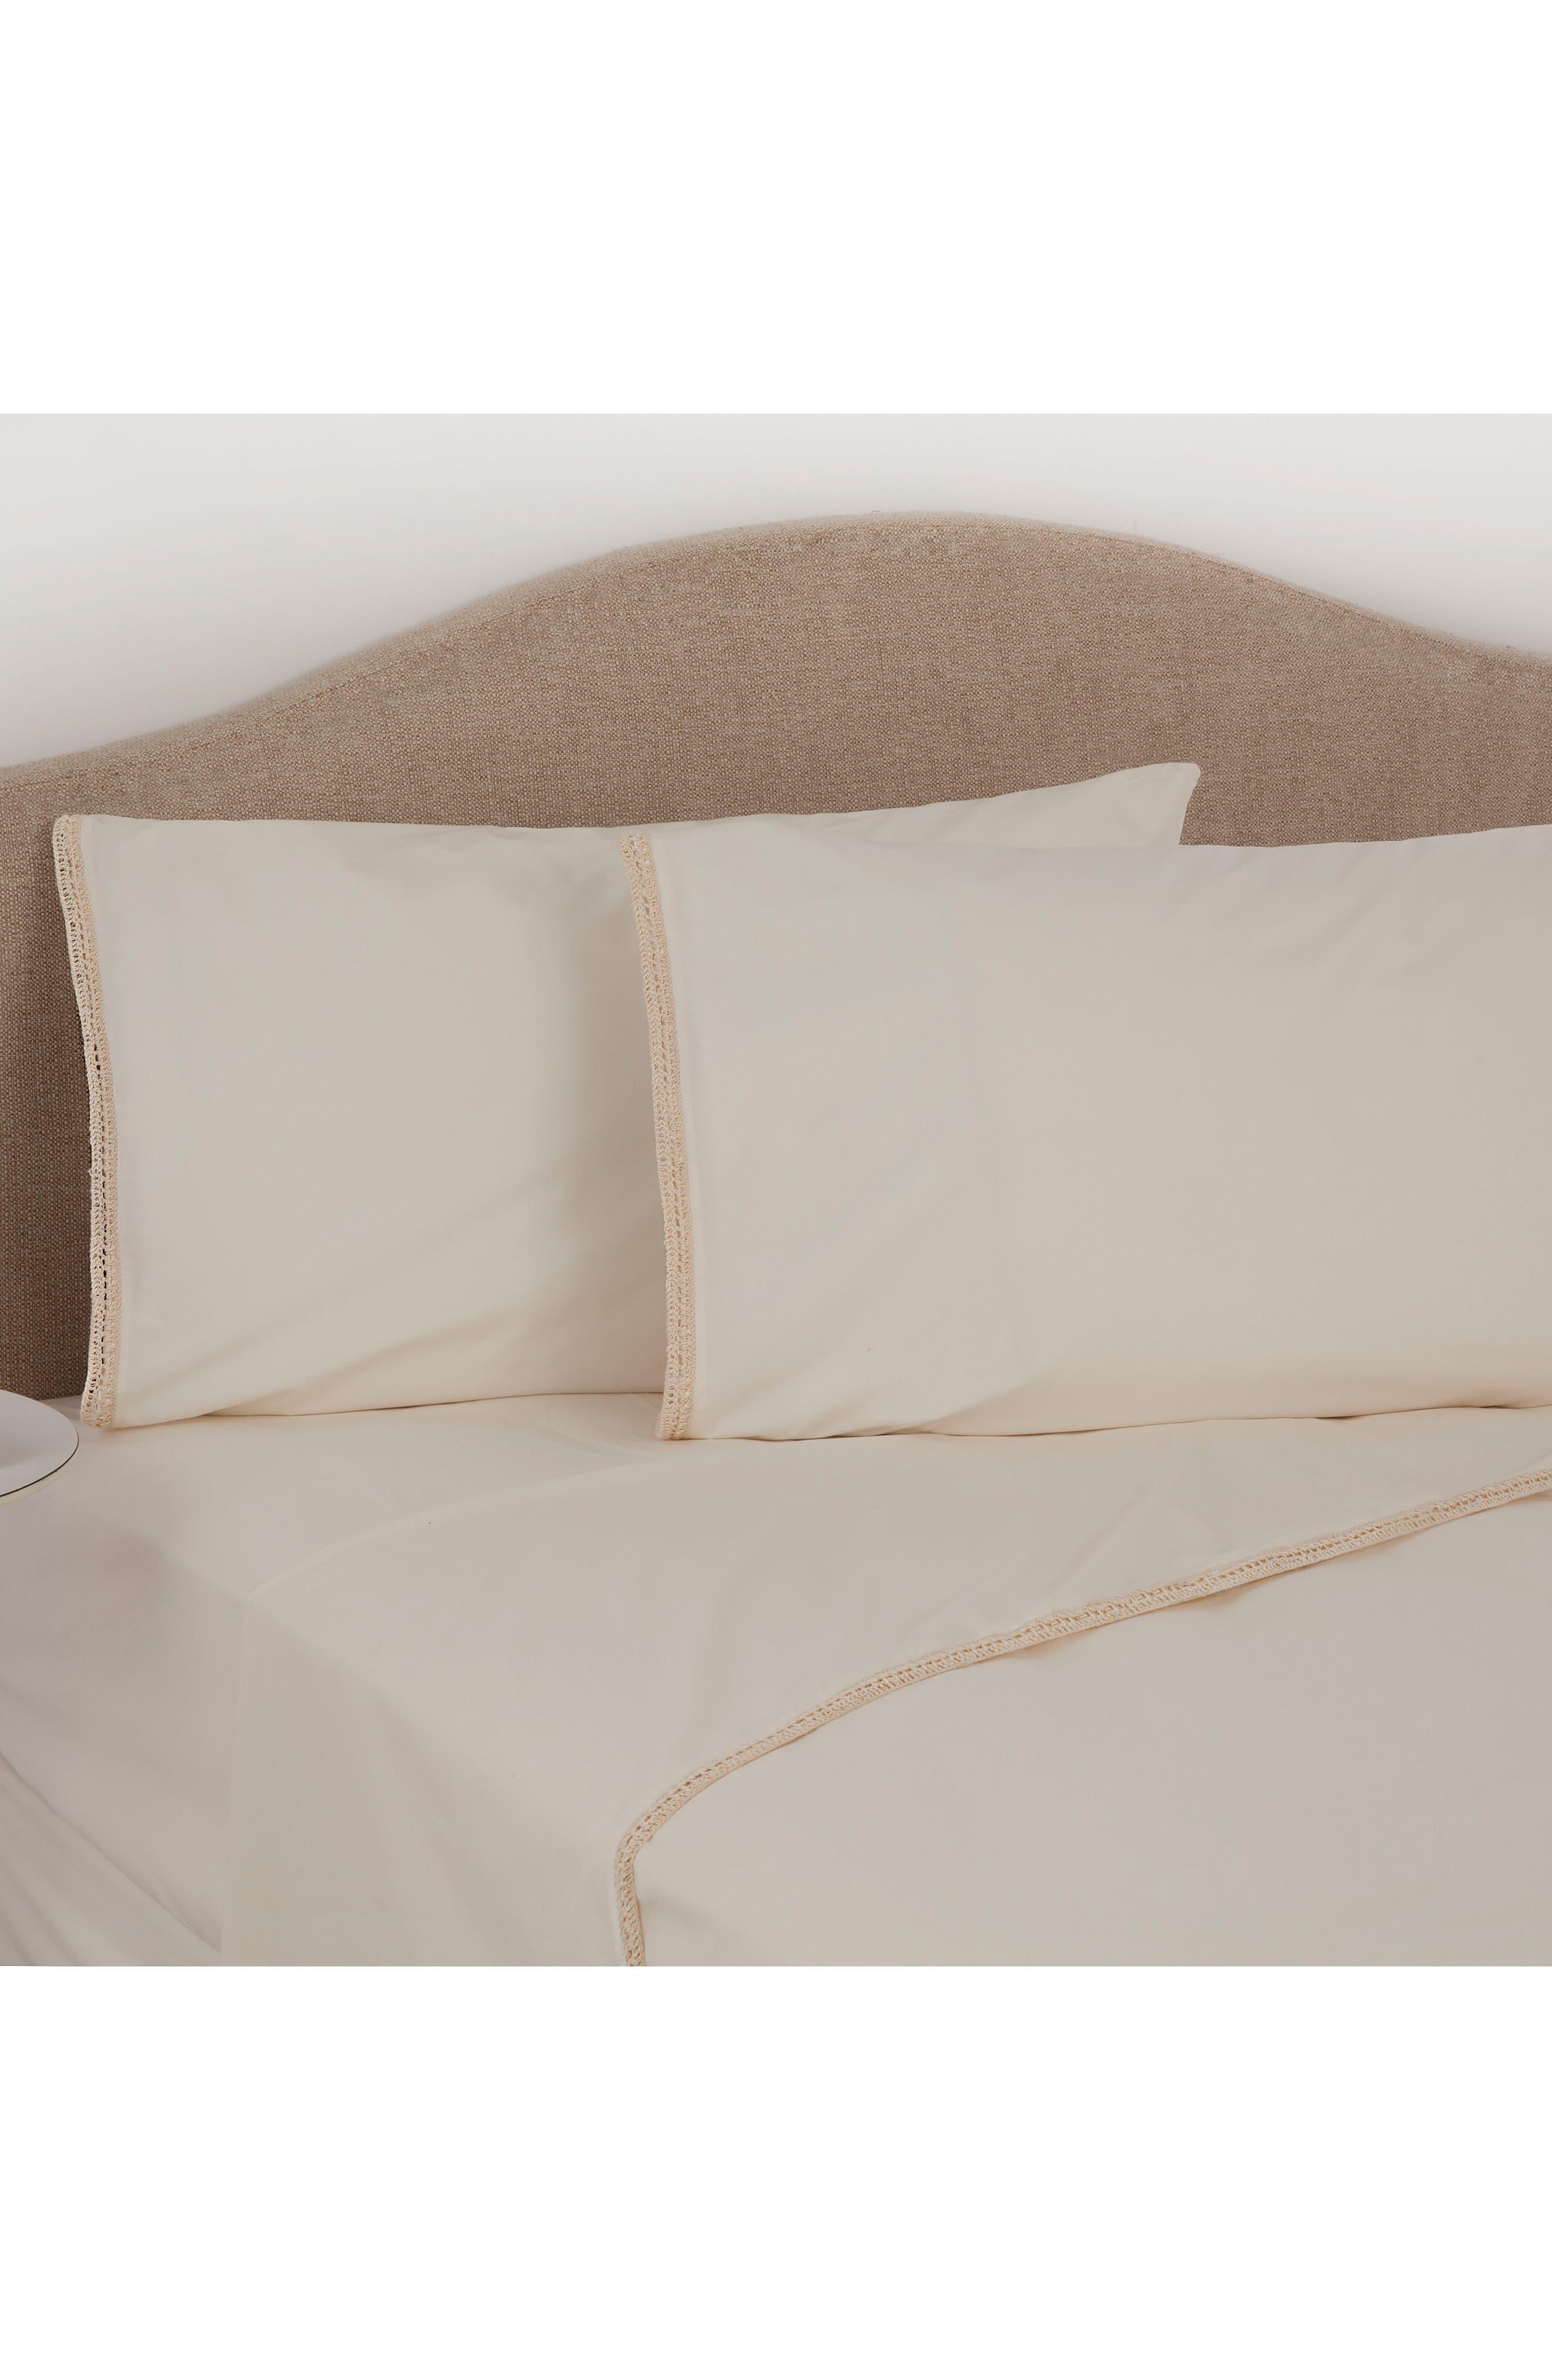 Main Image - Portico Crochet Trim Organic Cotton Fitted Sheet